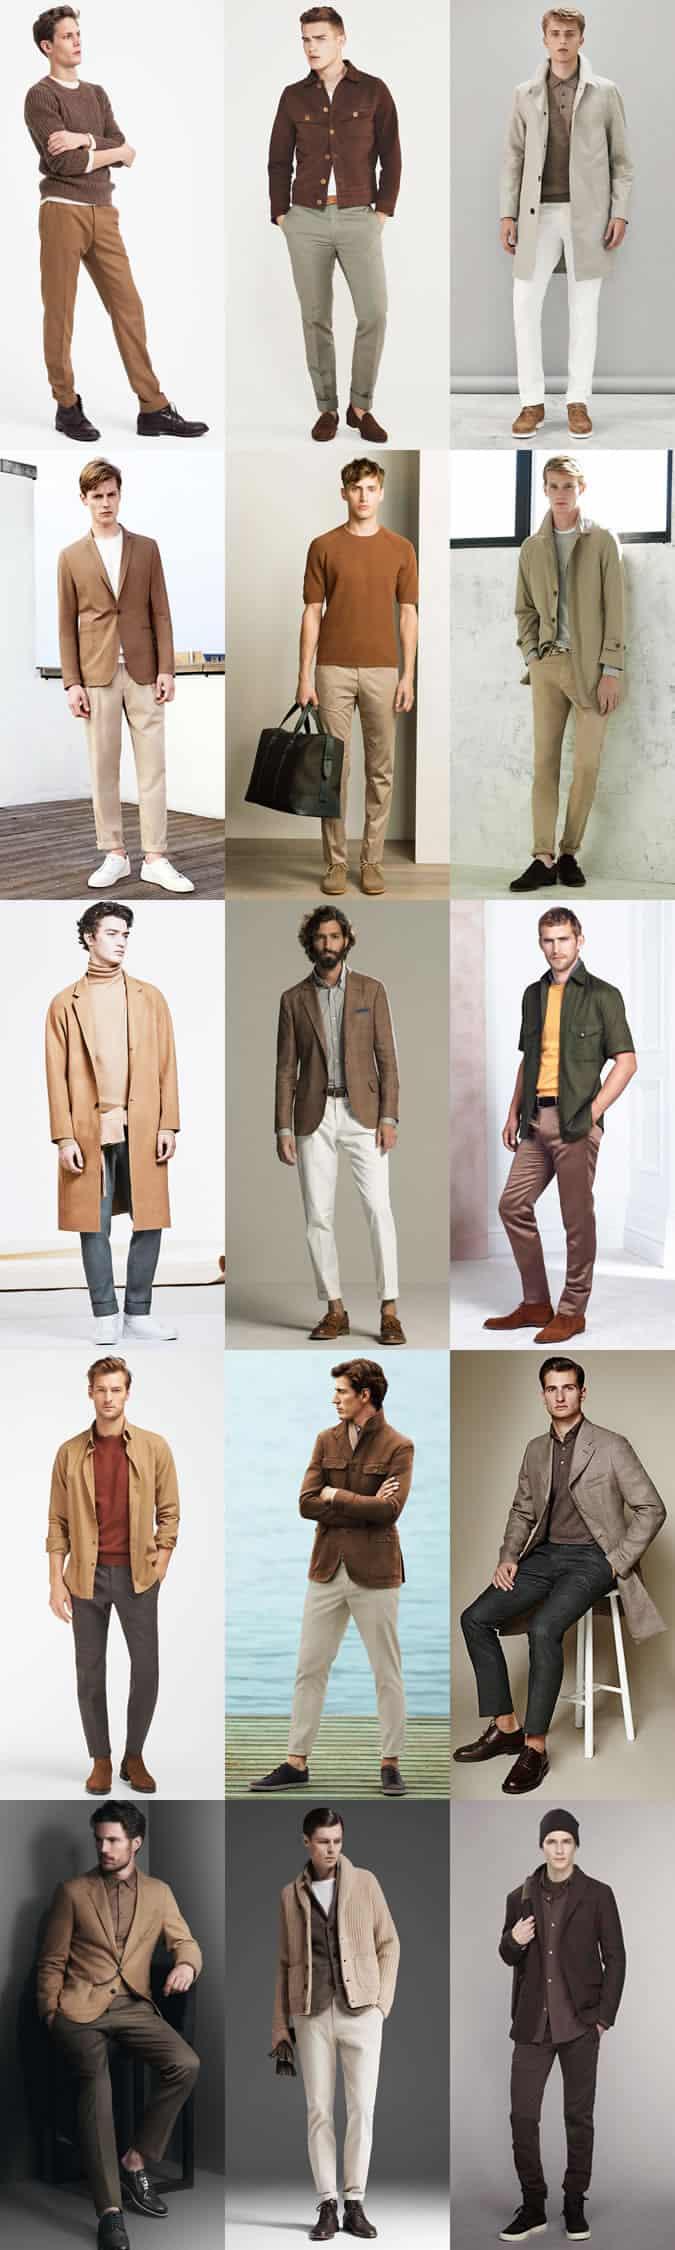 Earth Tones Palette Outfit Inspiration Lookbook pour homme